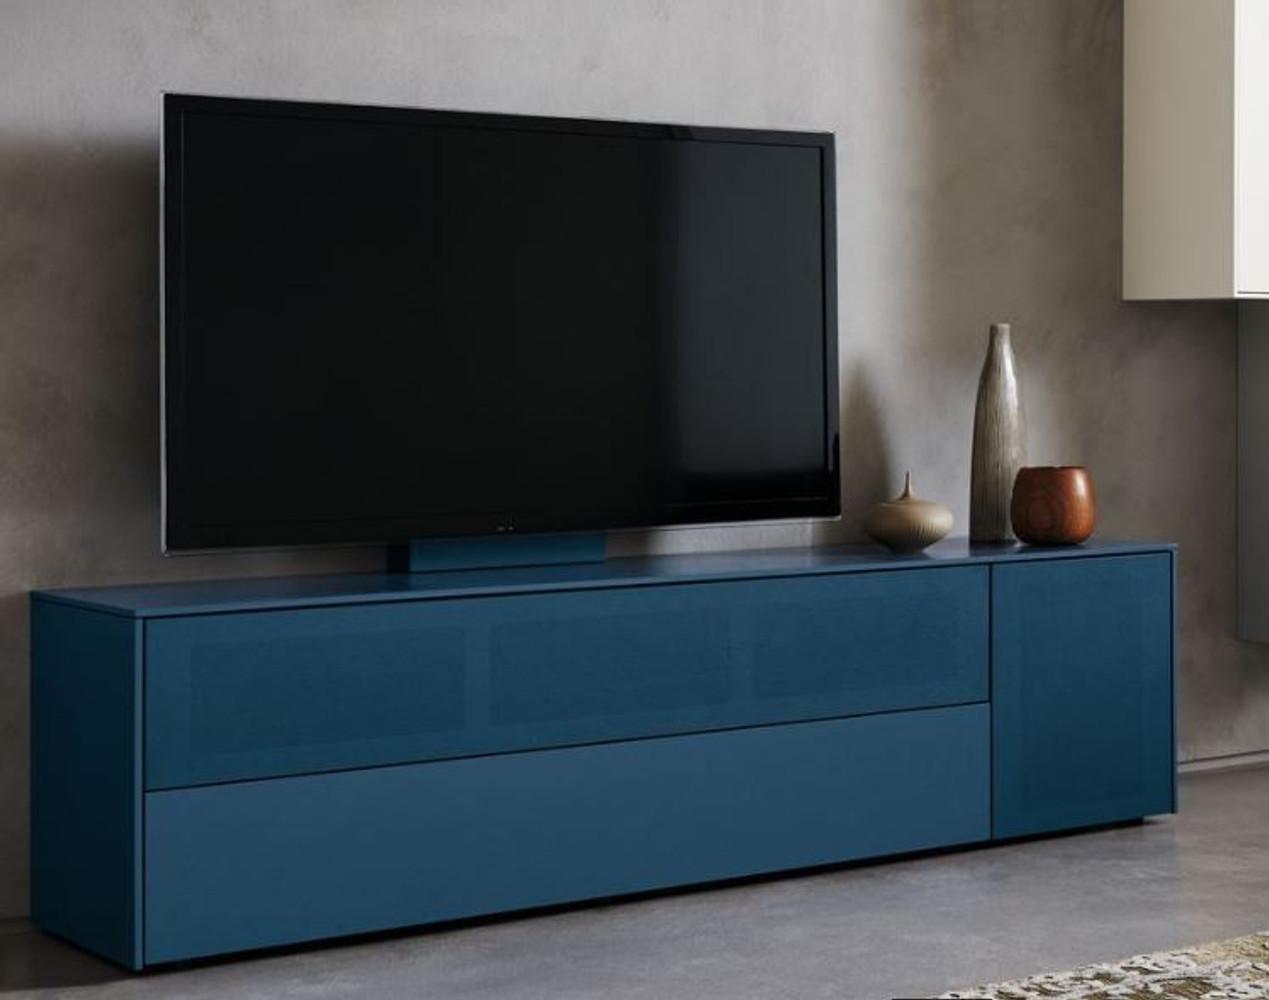 wk wohnen tv medienboard modell wk 419 intono soundbar versch lackfarben werkshagen. Black Bedroom Furniture Sets. Home Design Ideas